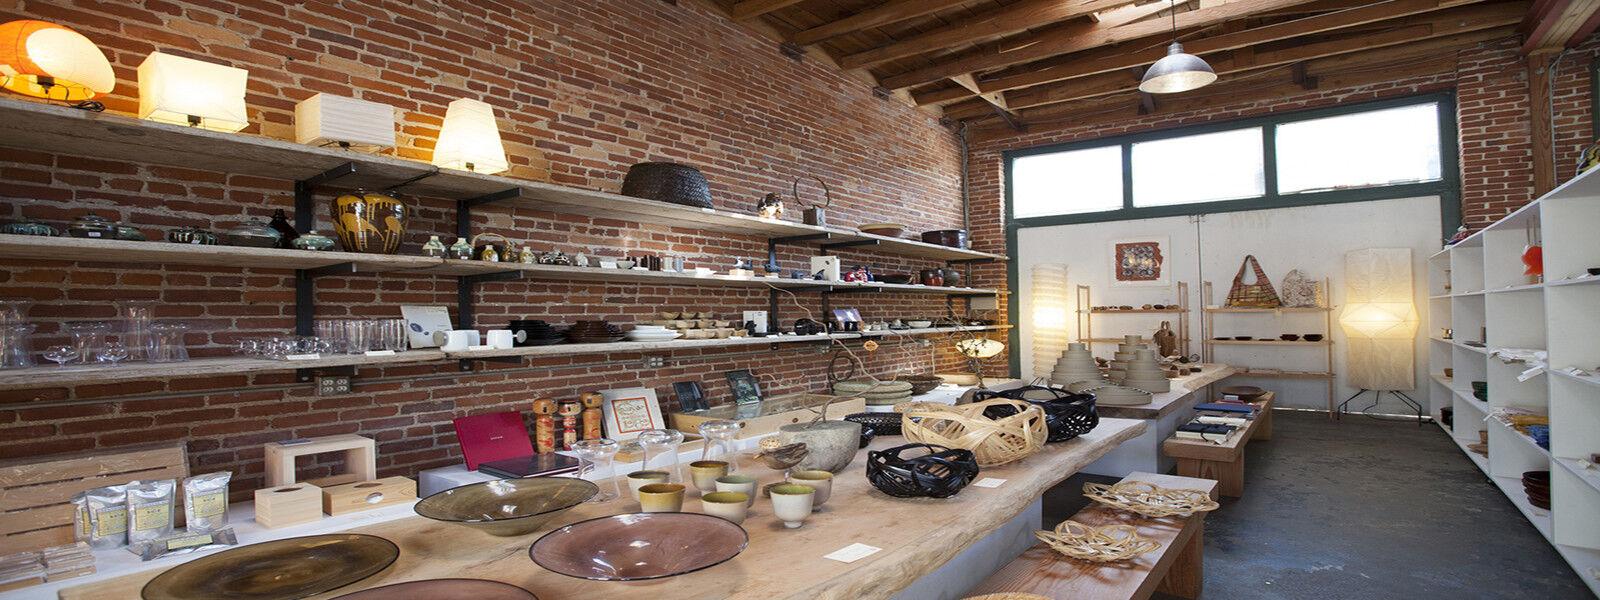 cb's Tehachapi Treasures